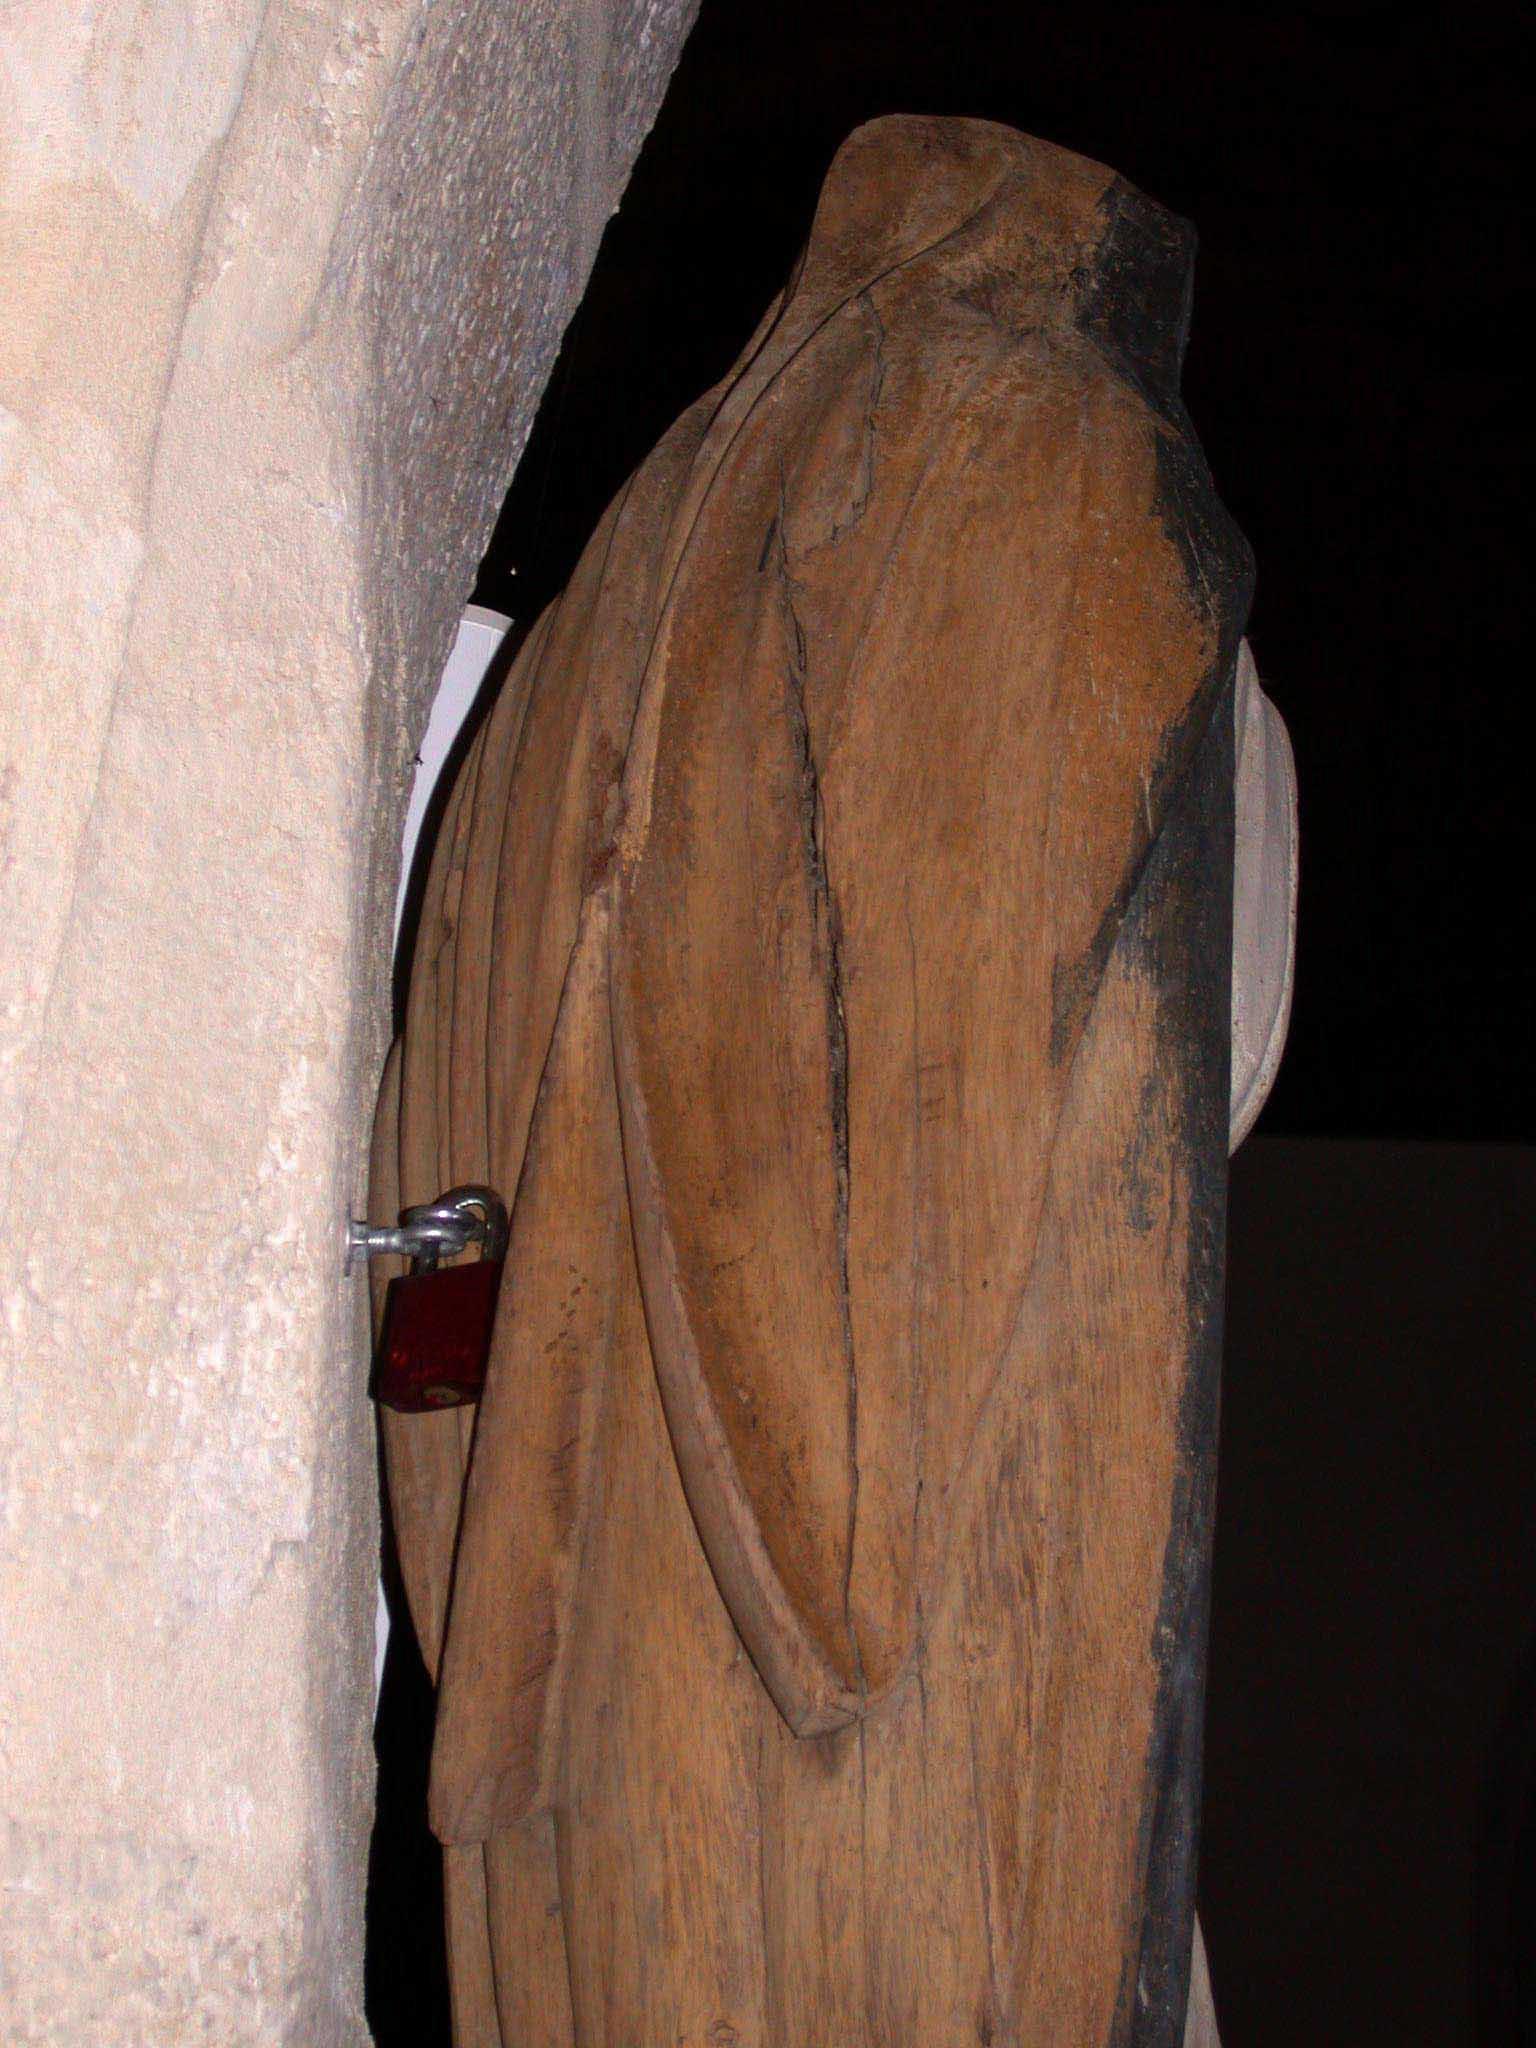 Fulbert Dubois restauration patrimoine sécurisation sculpture